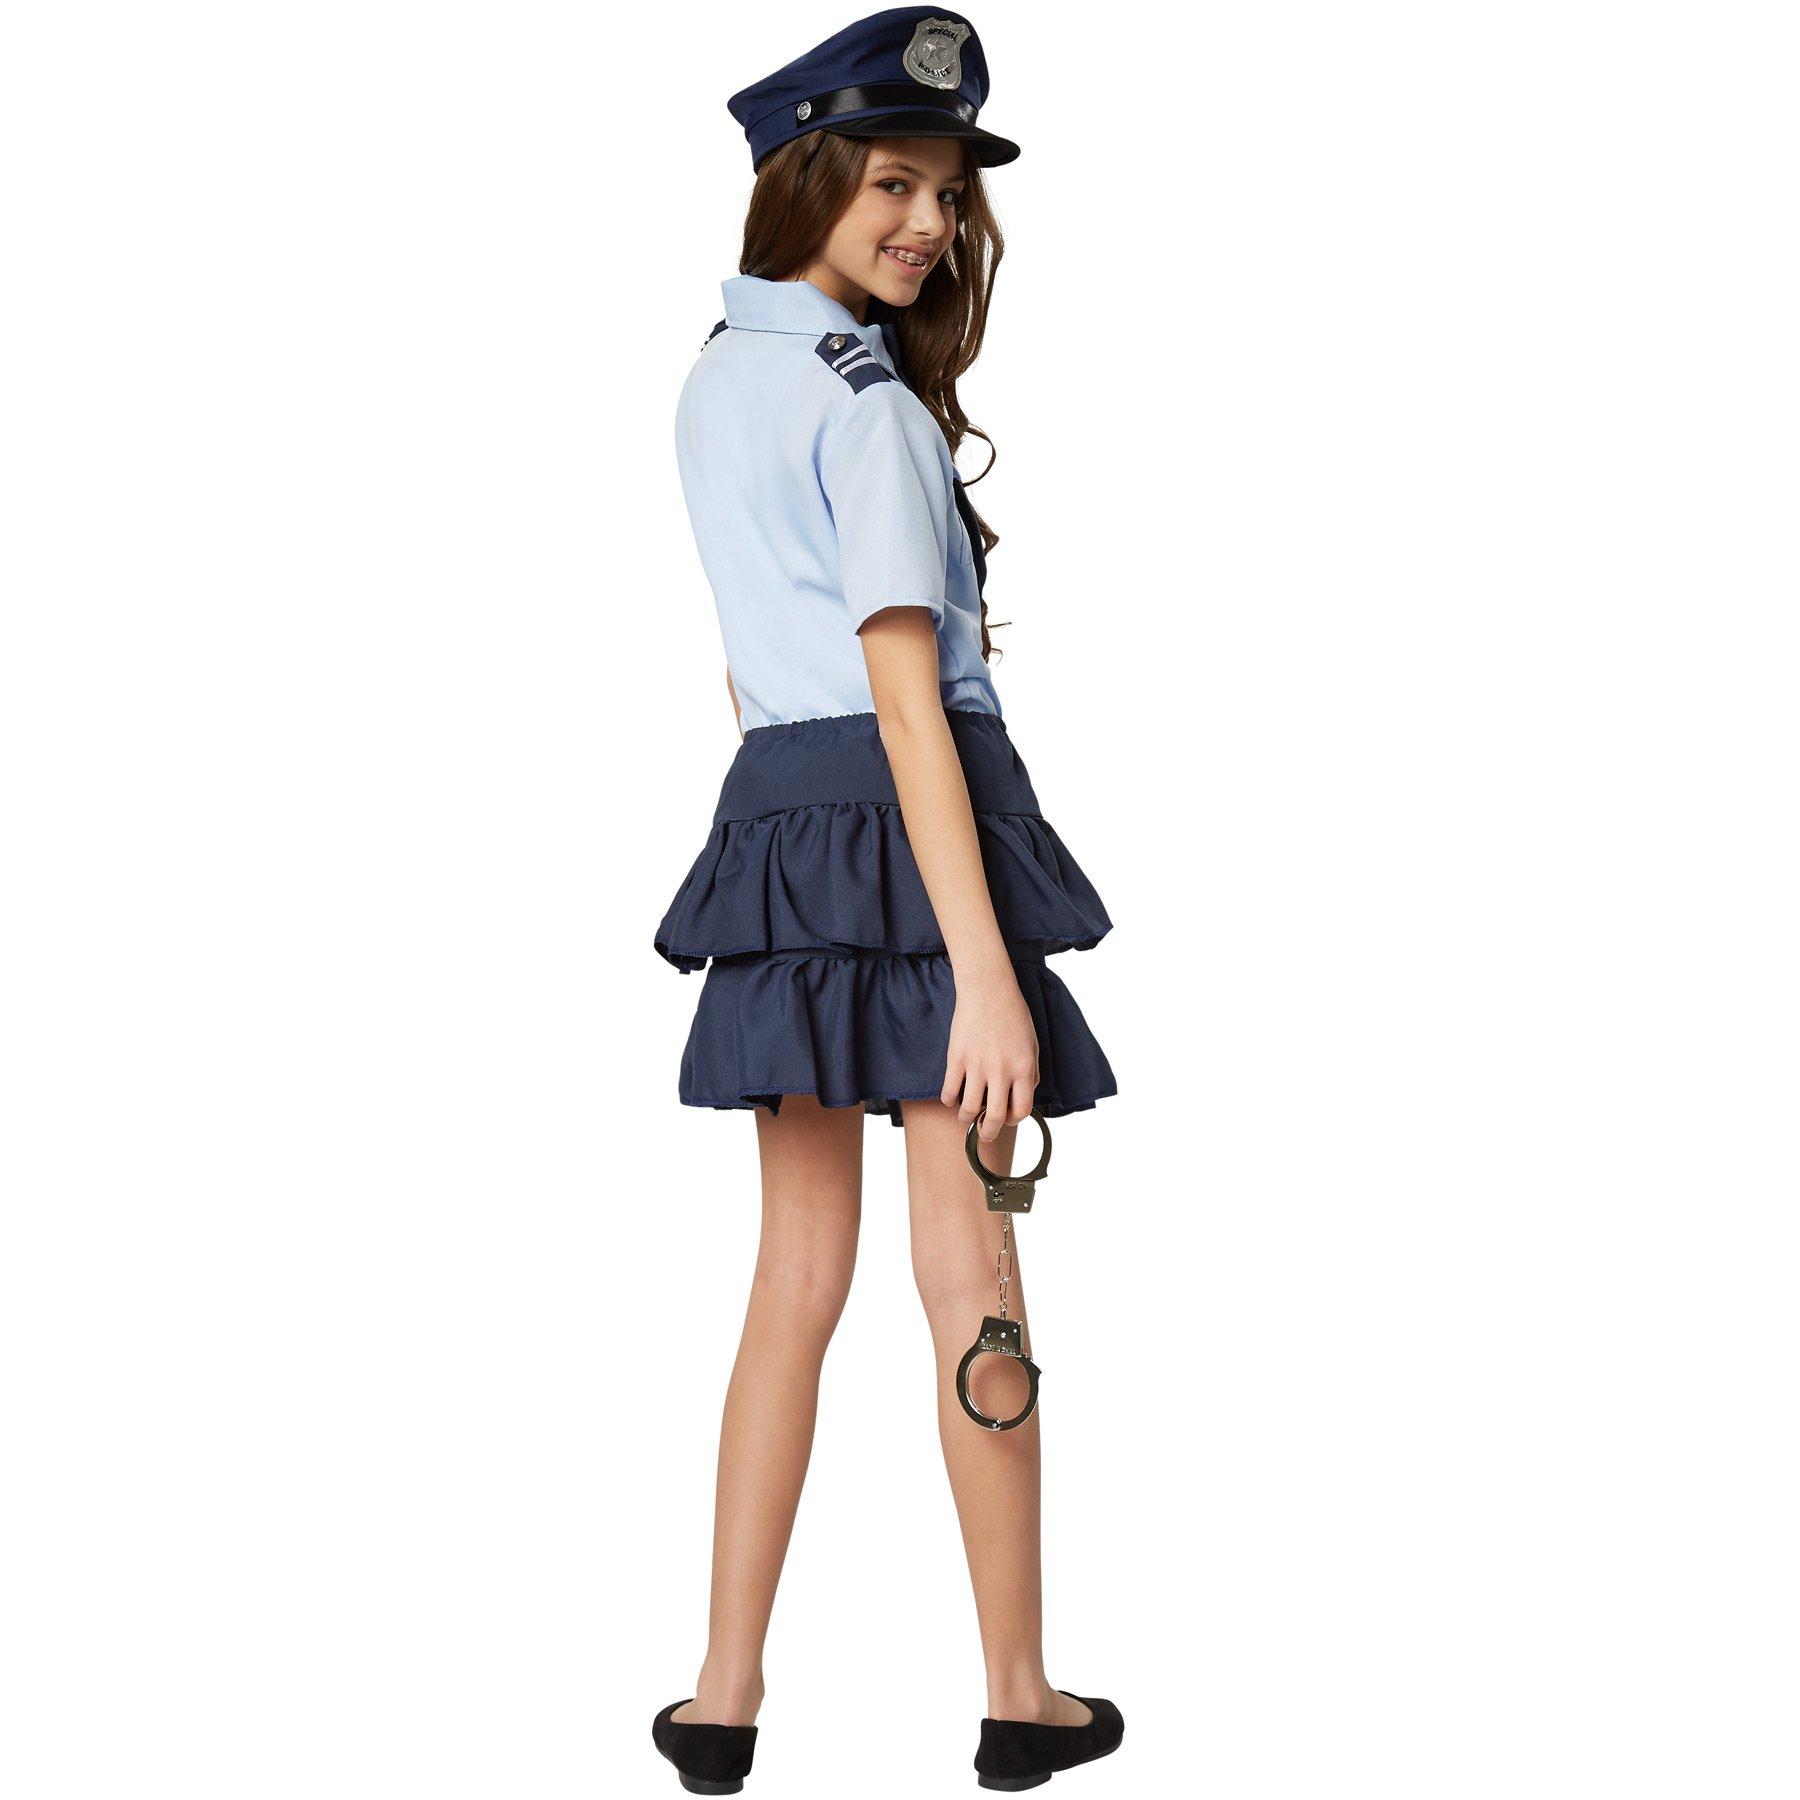 dressforfun 900268 Disfraz de Policía para Chica, Camisa de Manga ...